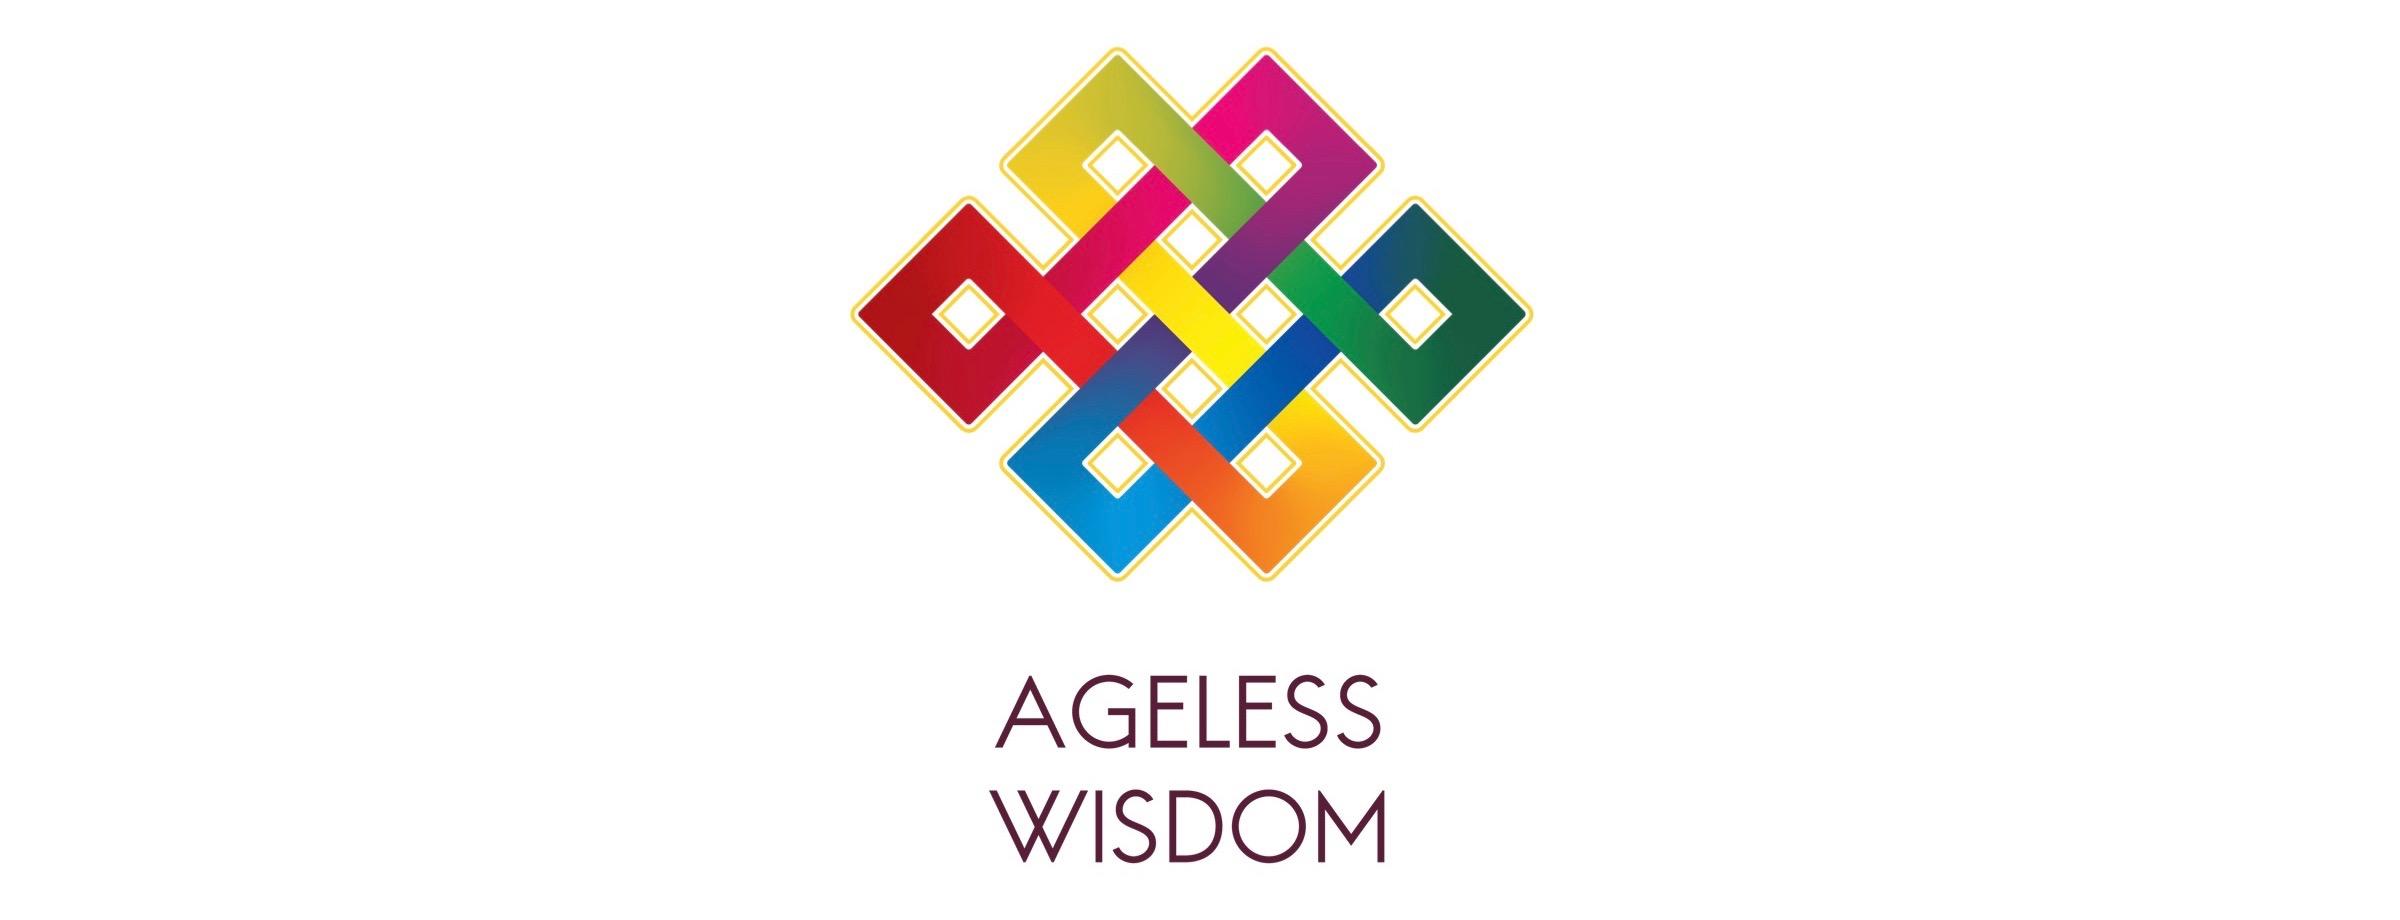 Ageless Wisdom.jpeg